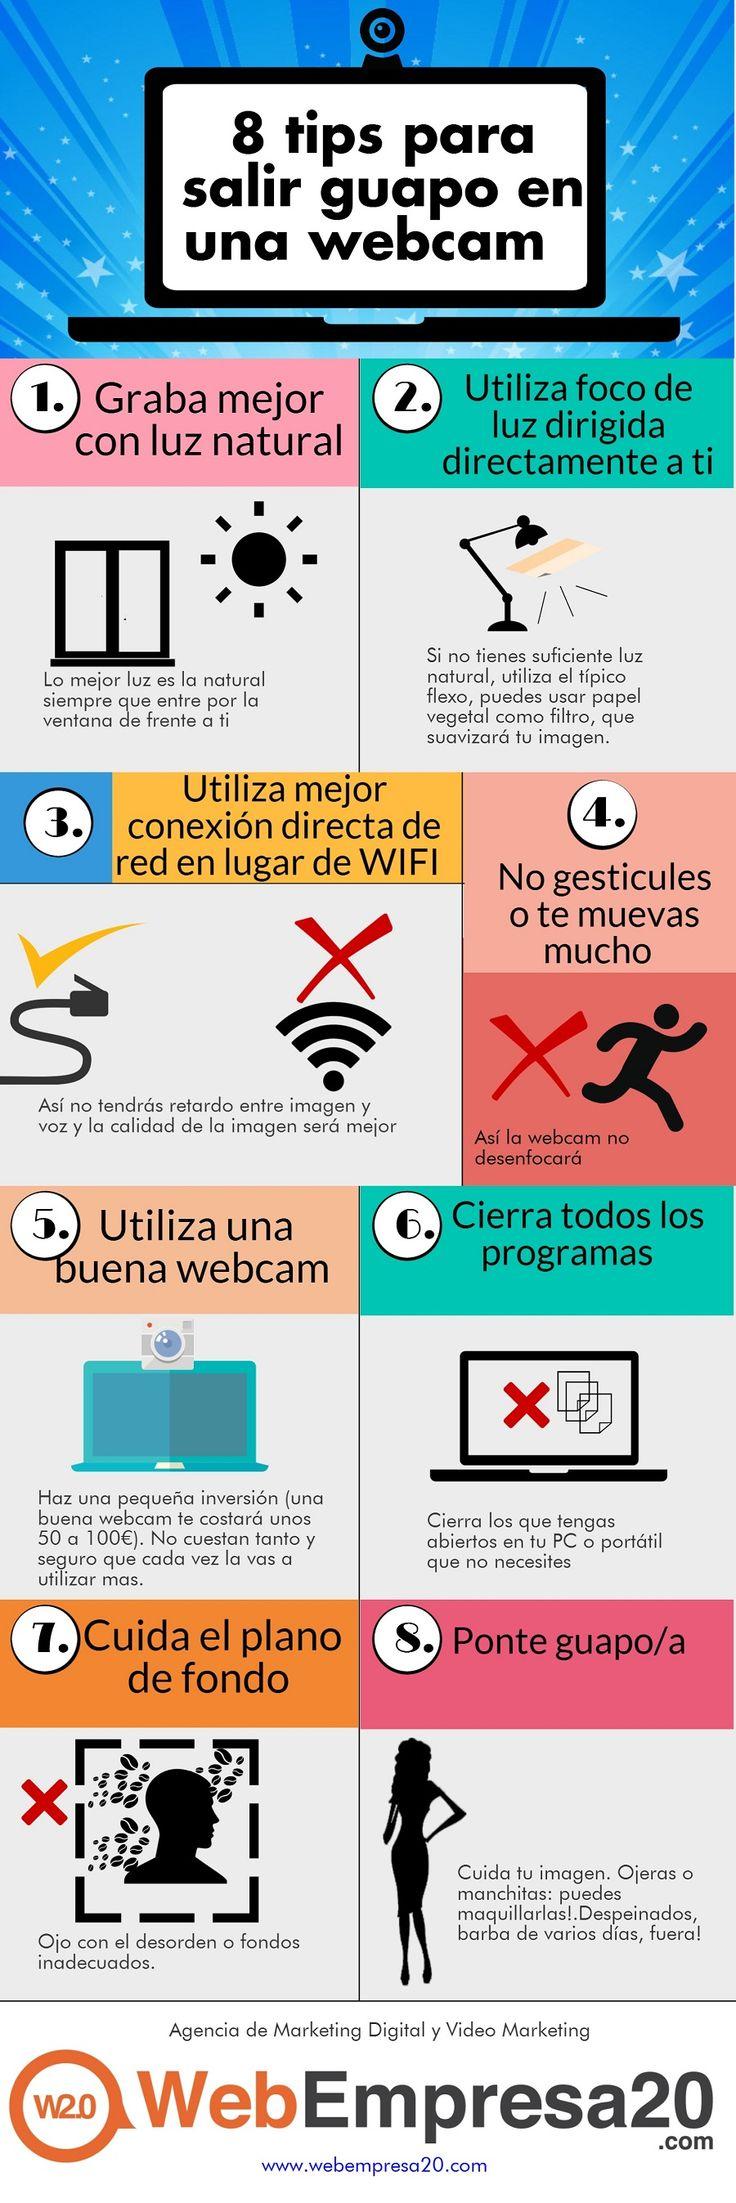 8 tips para salir guapo en una webcam  #infografia #infographic